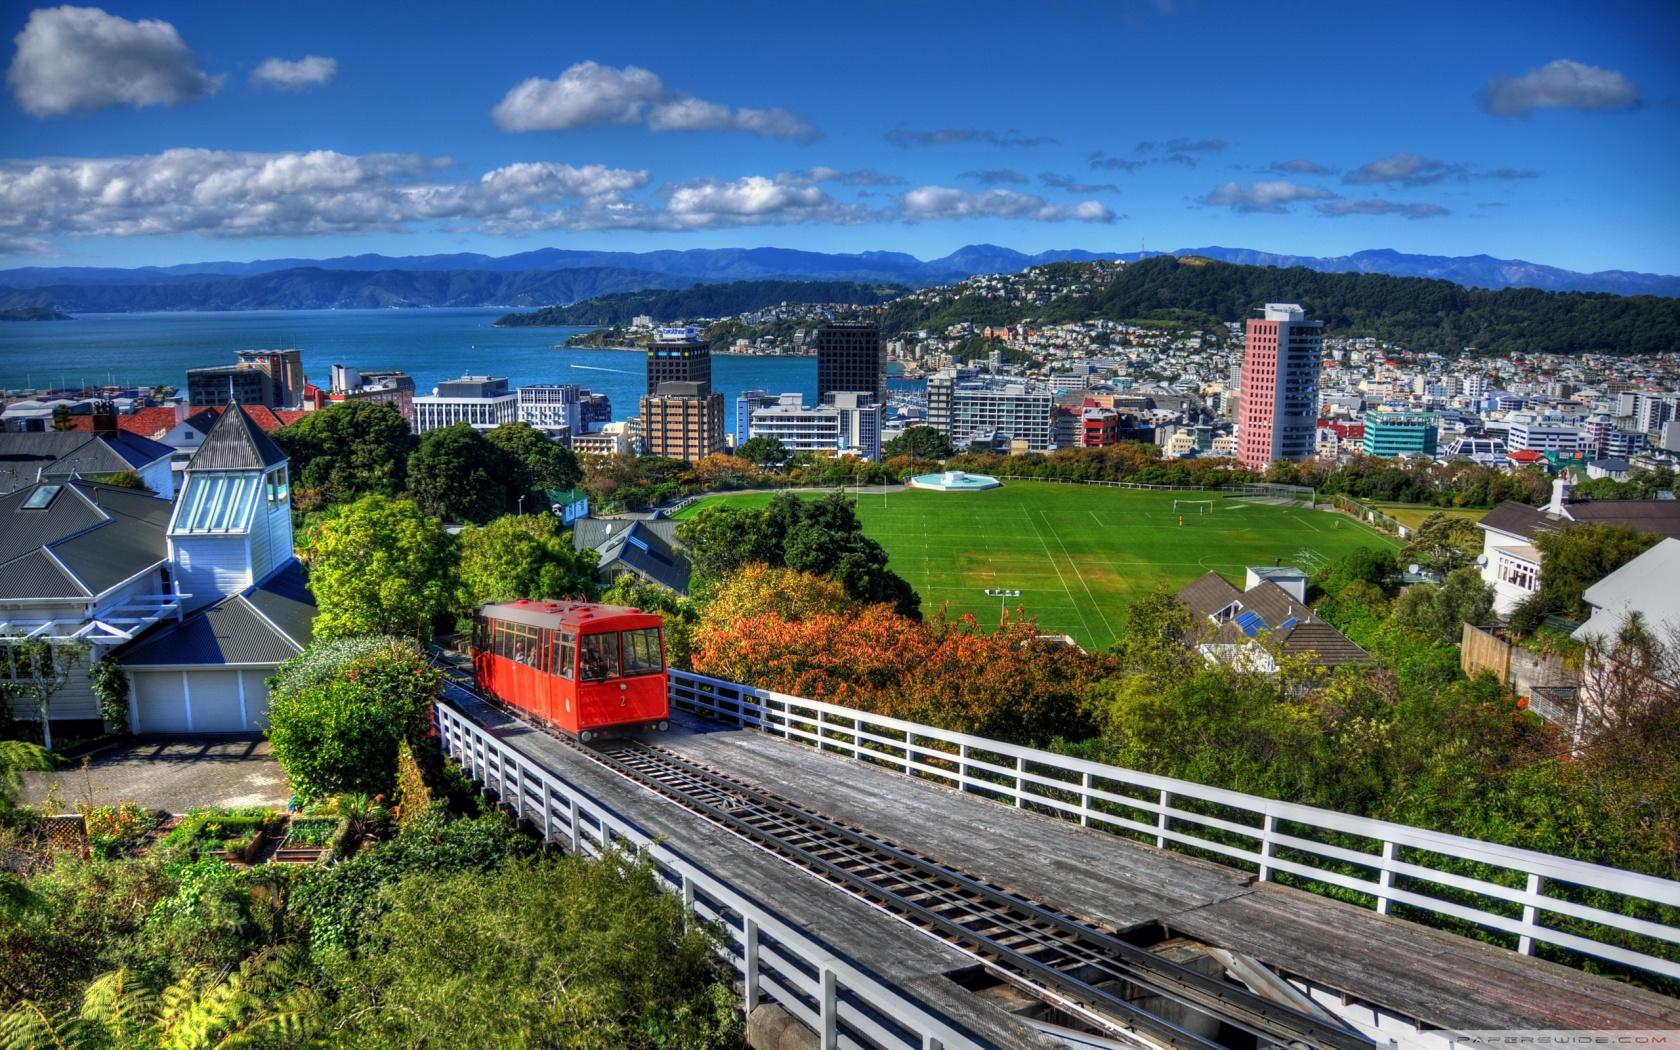 New Zealand Houses Wellington From Above 4K HD Desktop 1680x1050